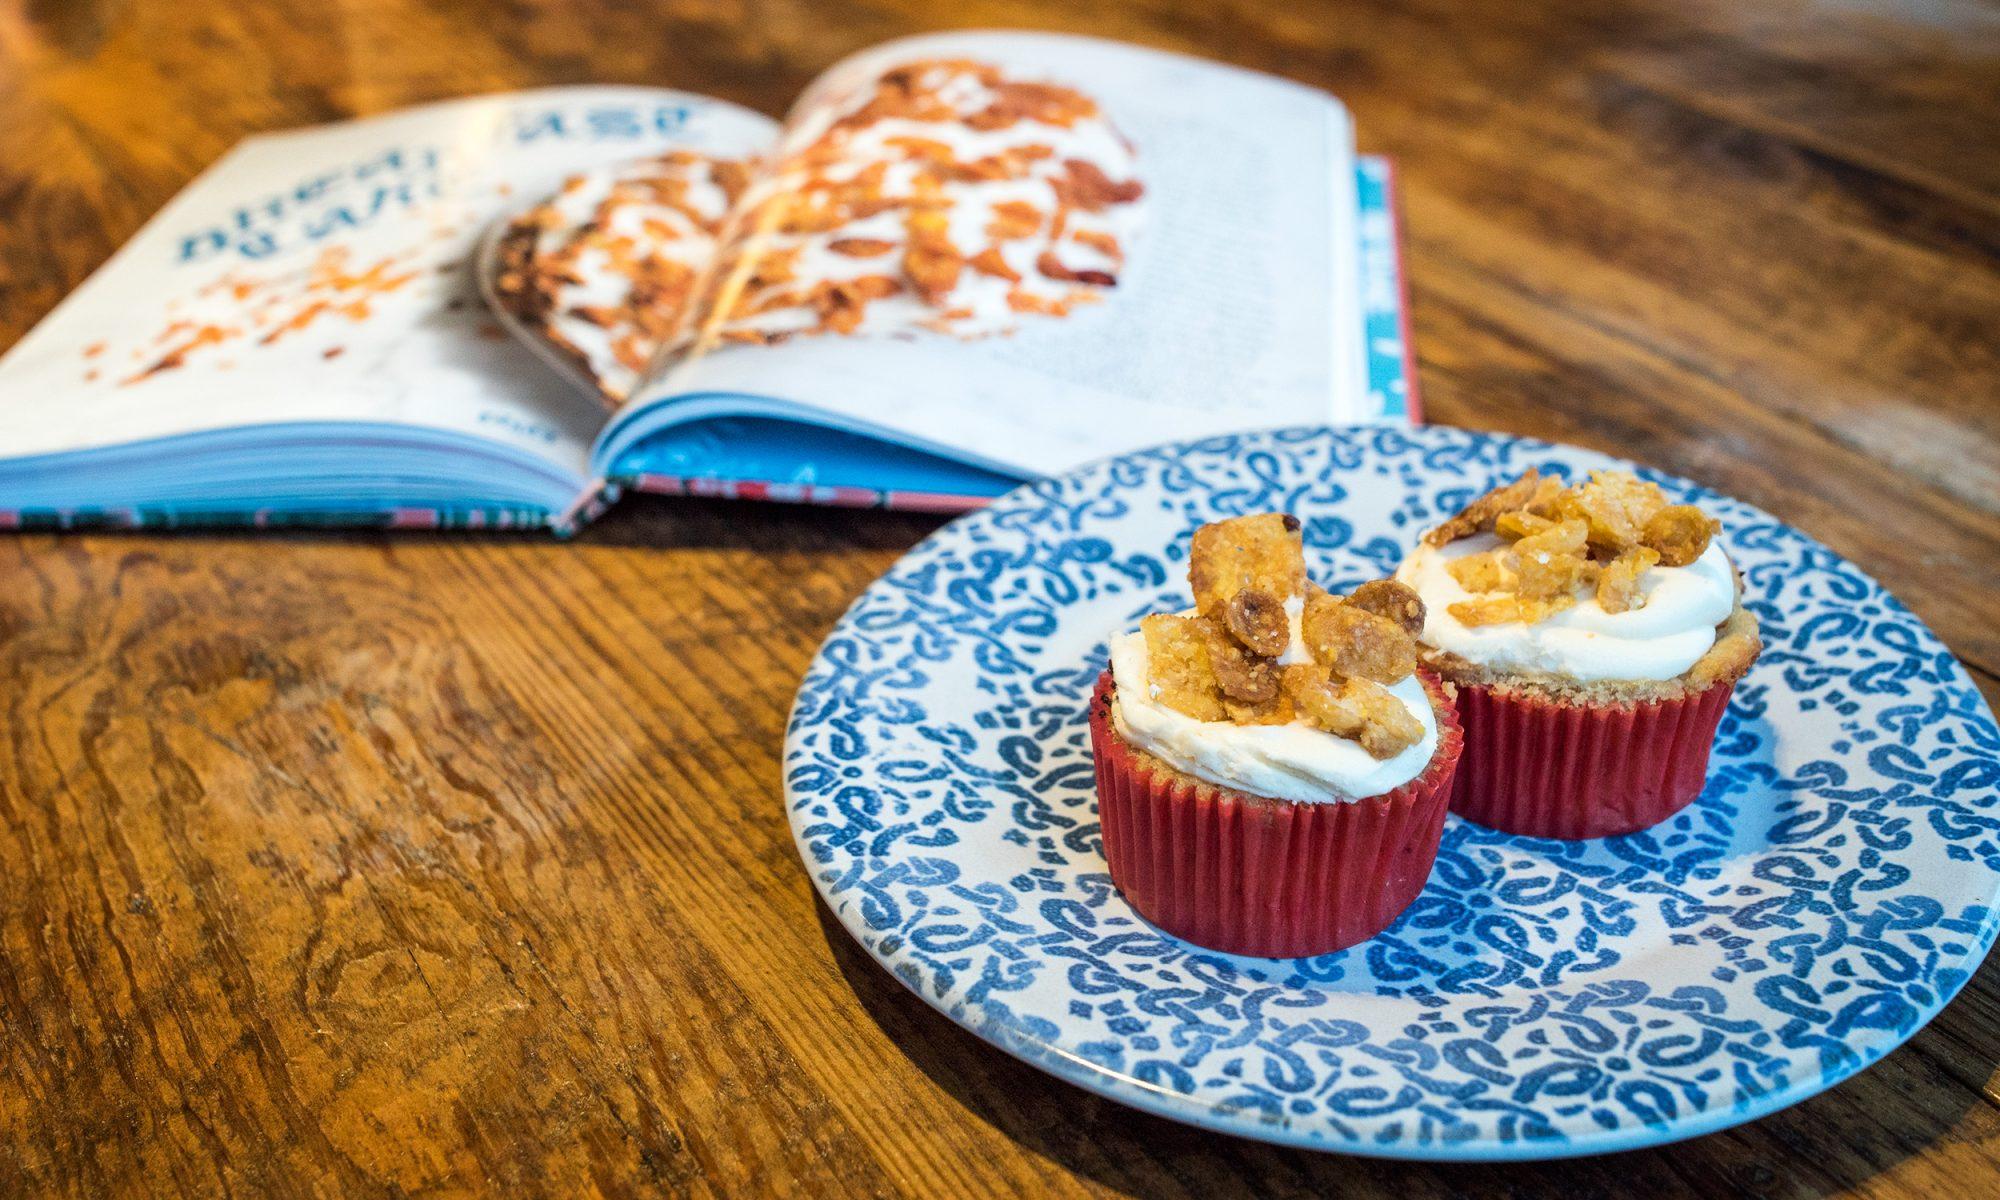 EC: This Vegan Breakfast Cake Tastes Like a Bowl of Cornflakes